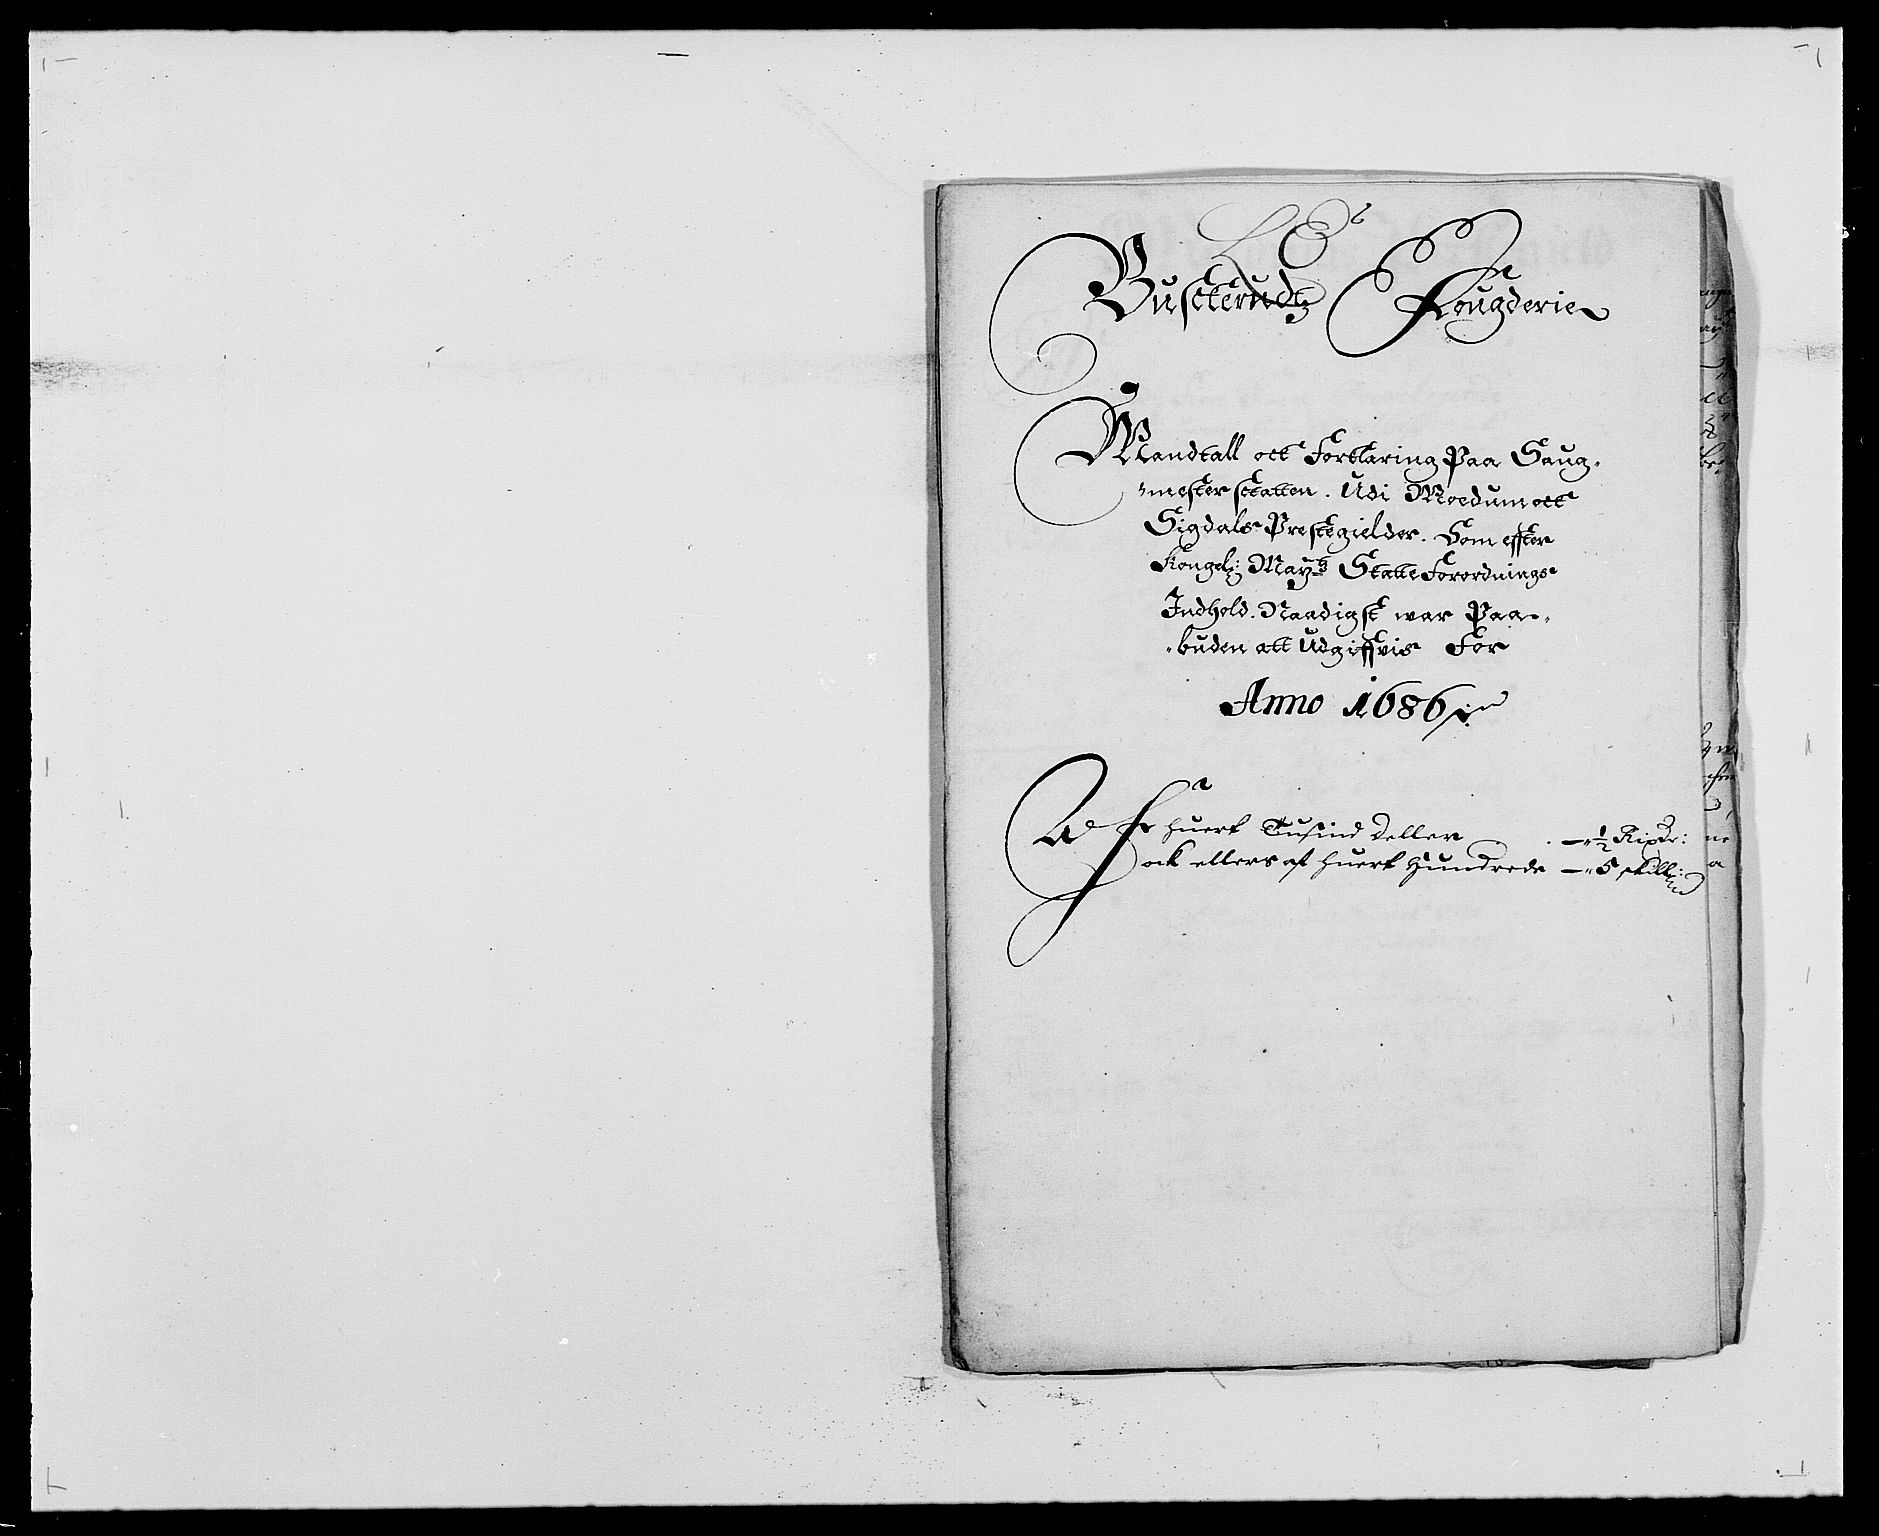 RA, Rentekammeret inntil 1814, Reviderte regnskaper, Fogderegnskap, R25/L1678: Fogderegnskap Buskerud, 1685-1686, s. 327